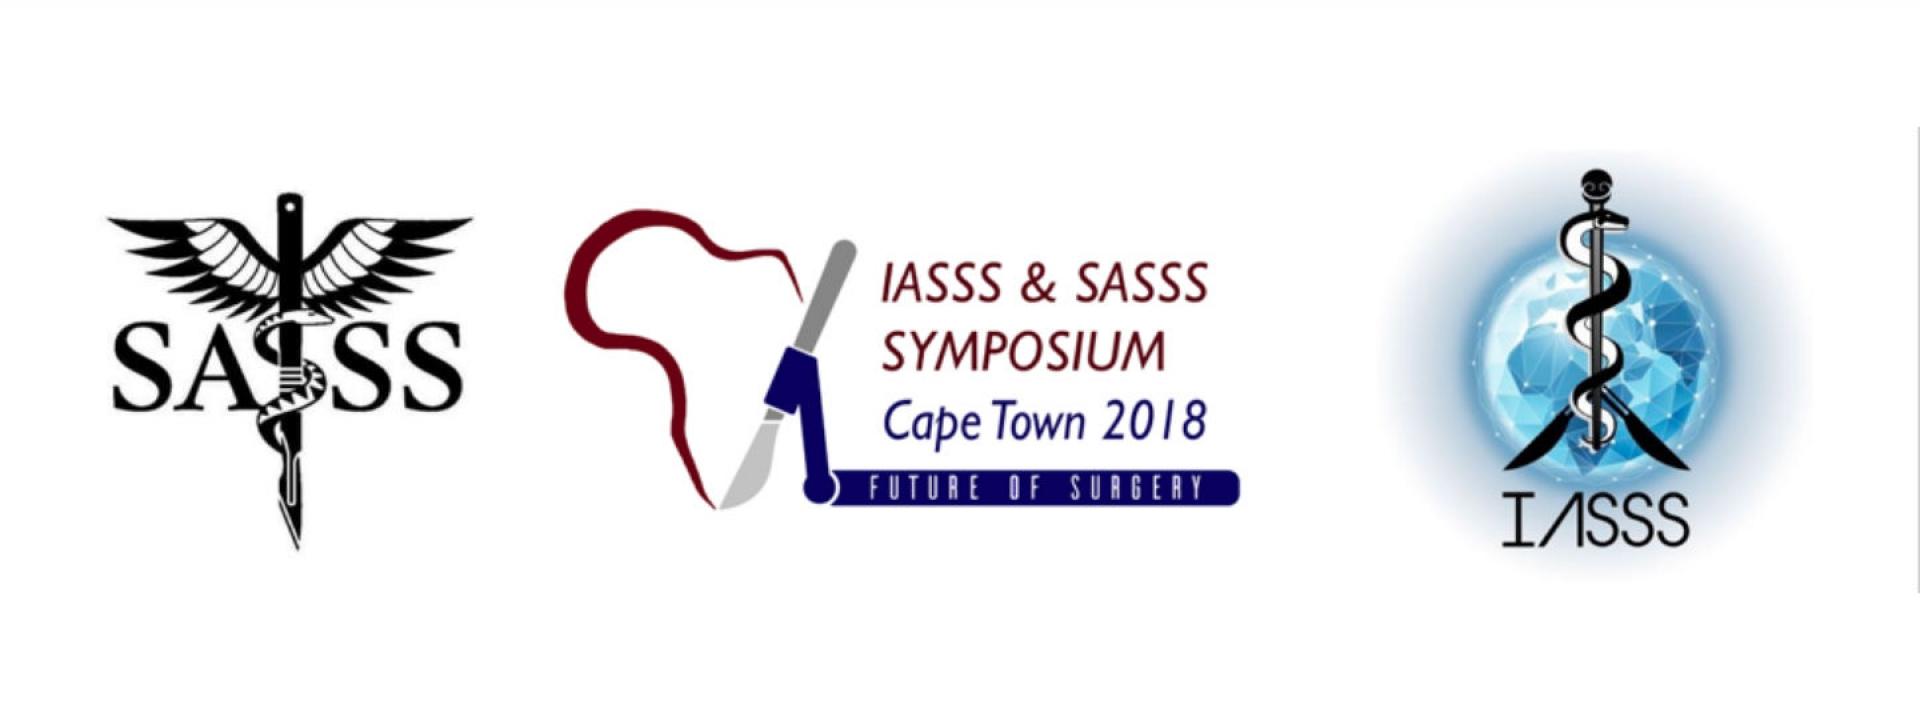 IASSS & SASSS Symposium 2018